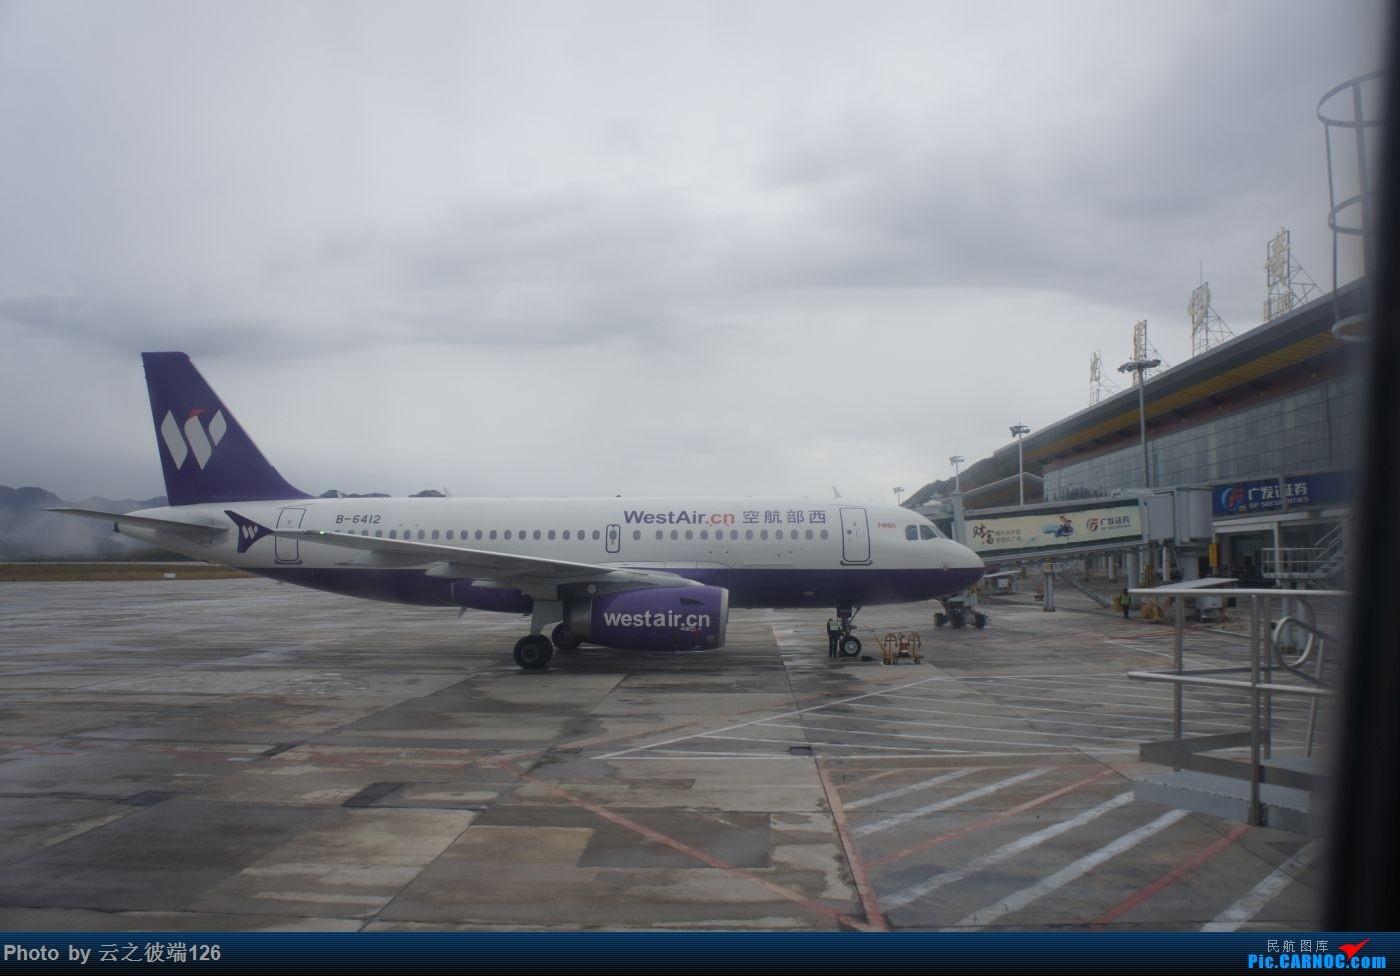 Re:[原创]KHN-CTU-JZH-CTU-NKG造访蜀地,体验世界里程最贵机票,多图 AIRBUS A319-100 B-6412 中国九寨黄龙机场